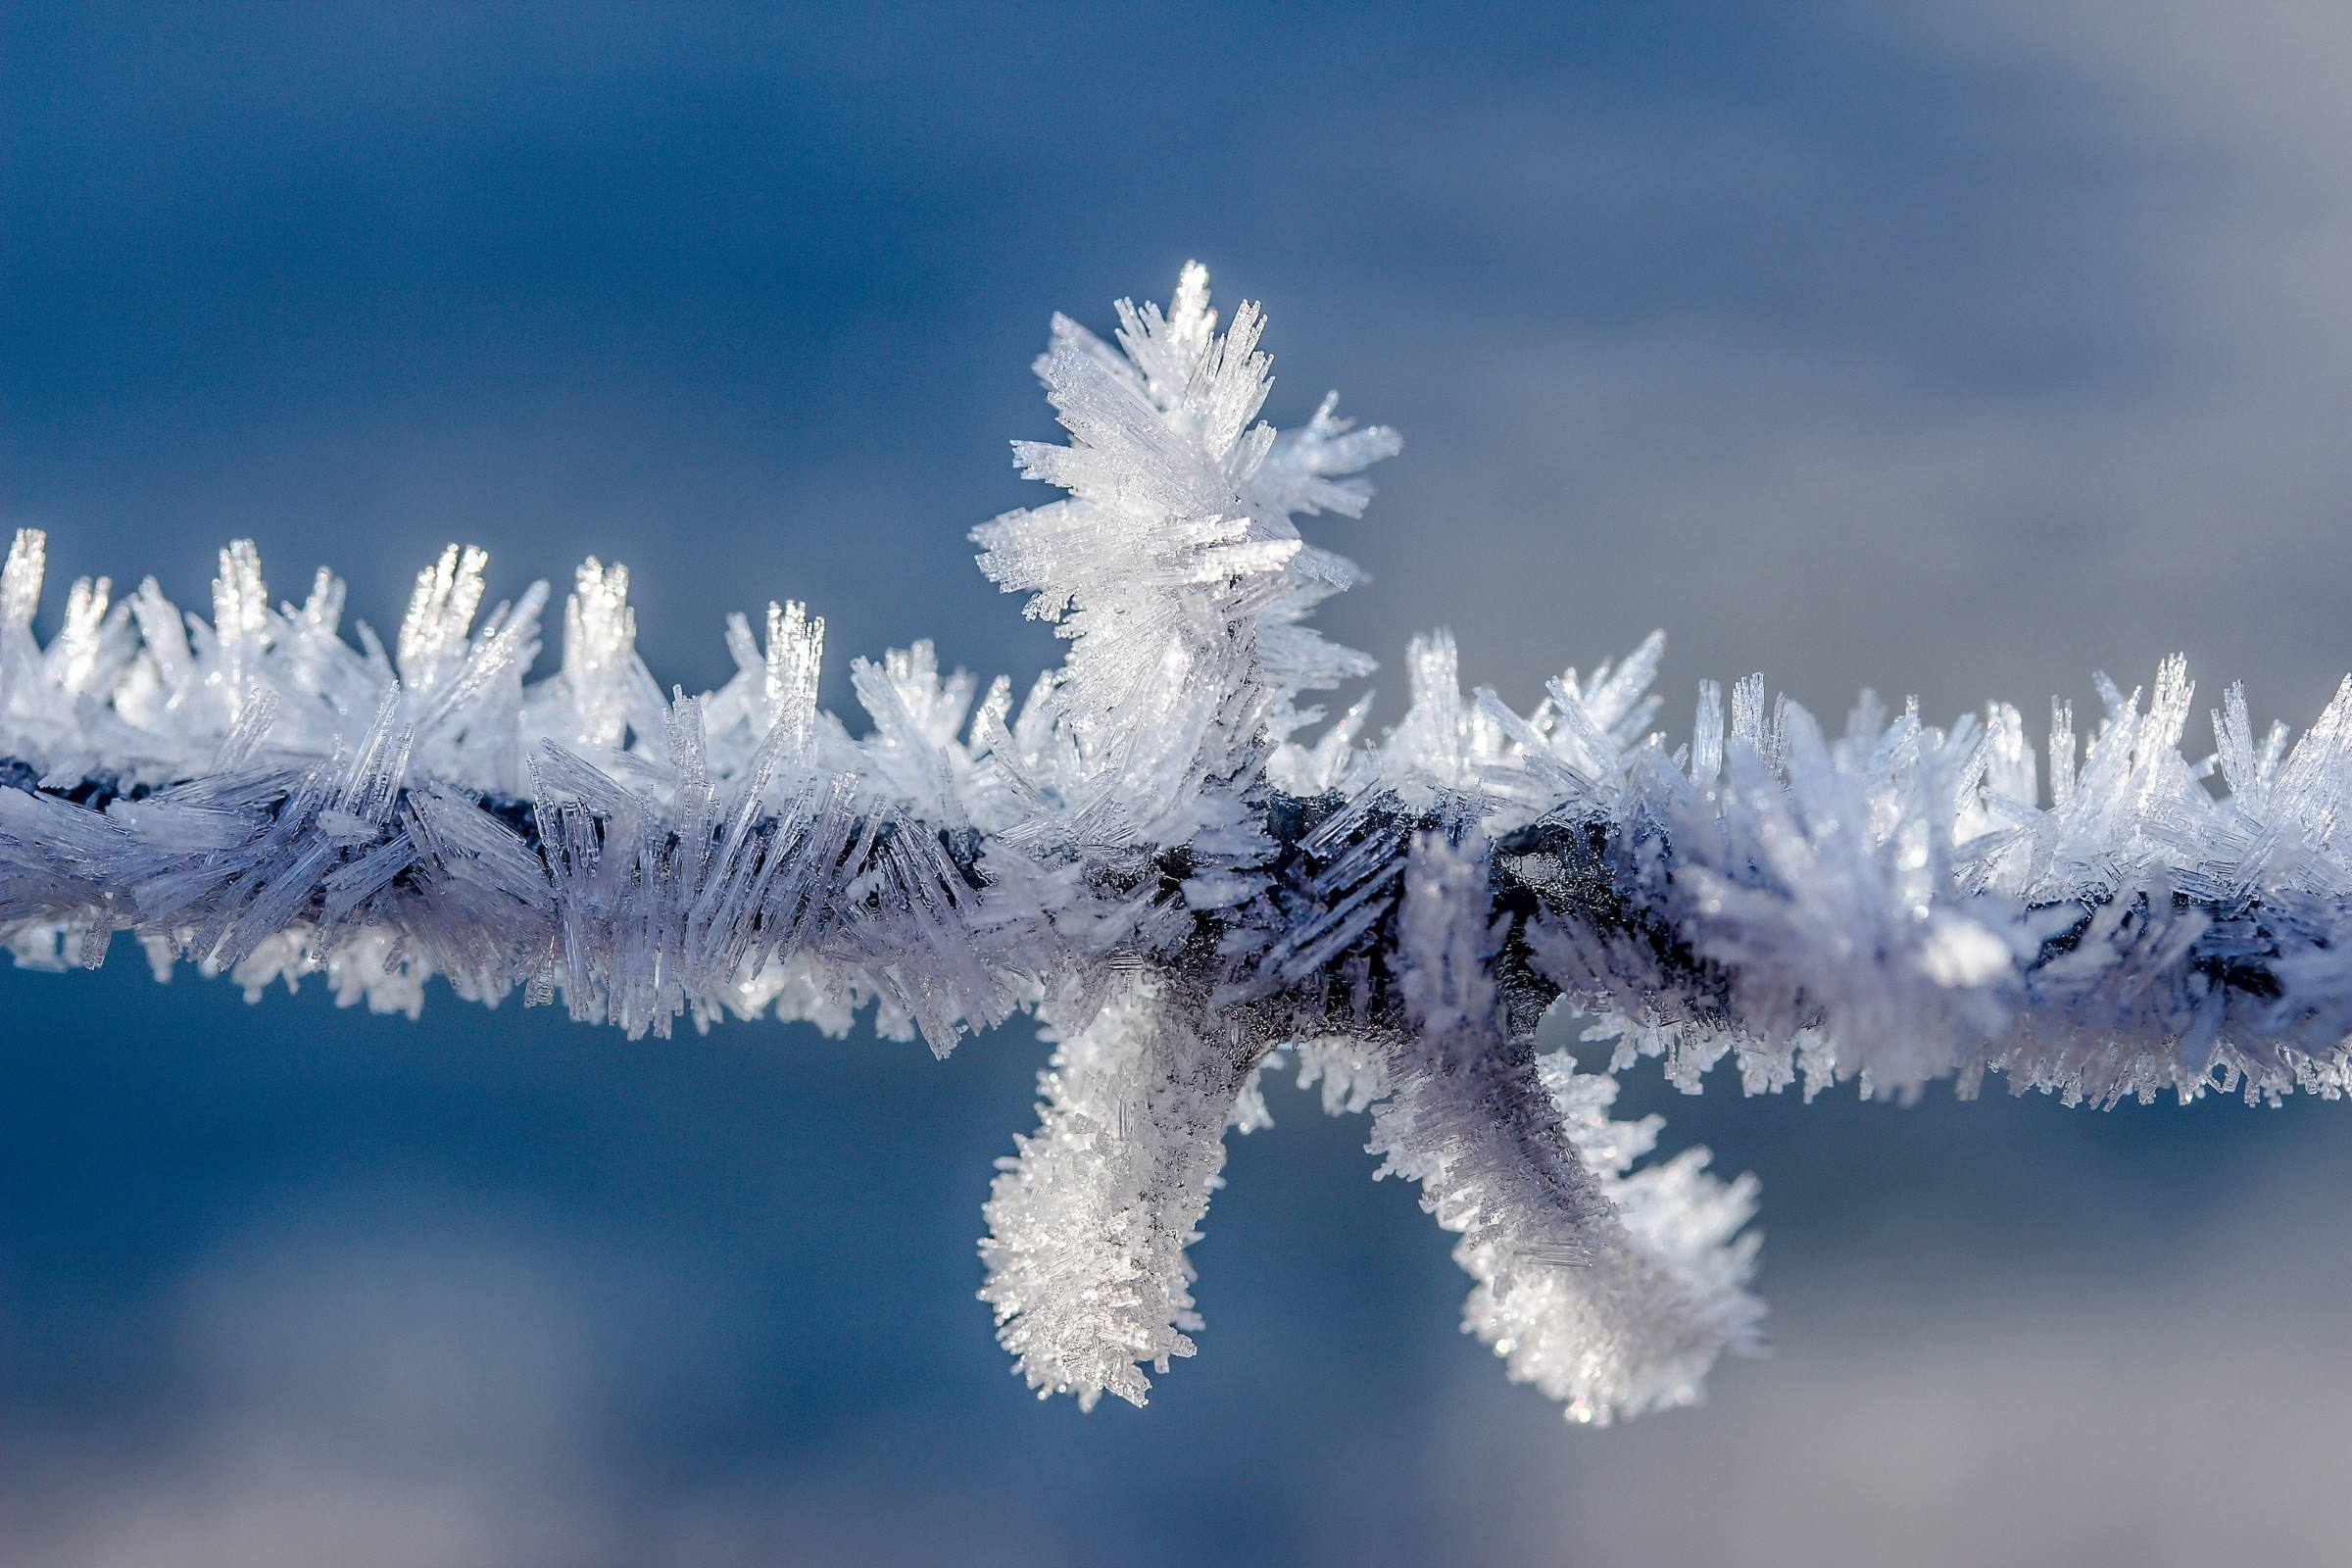 winter branch ice crystals frozen